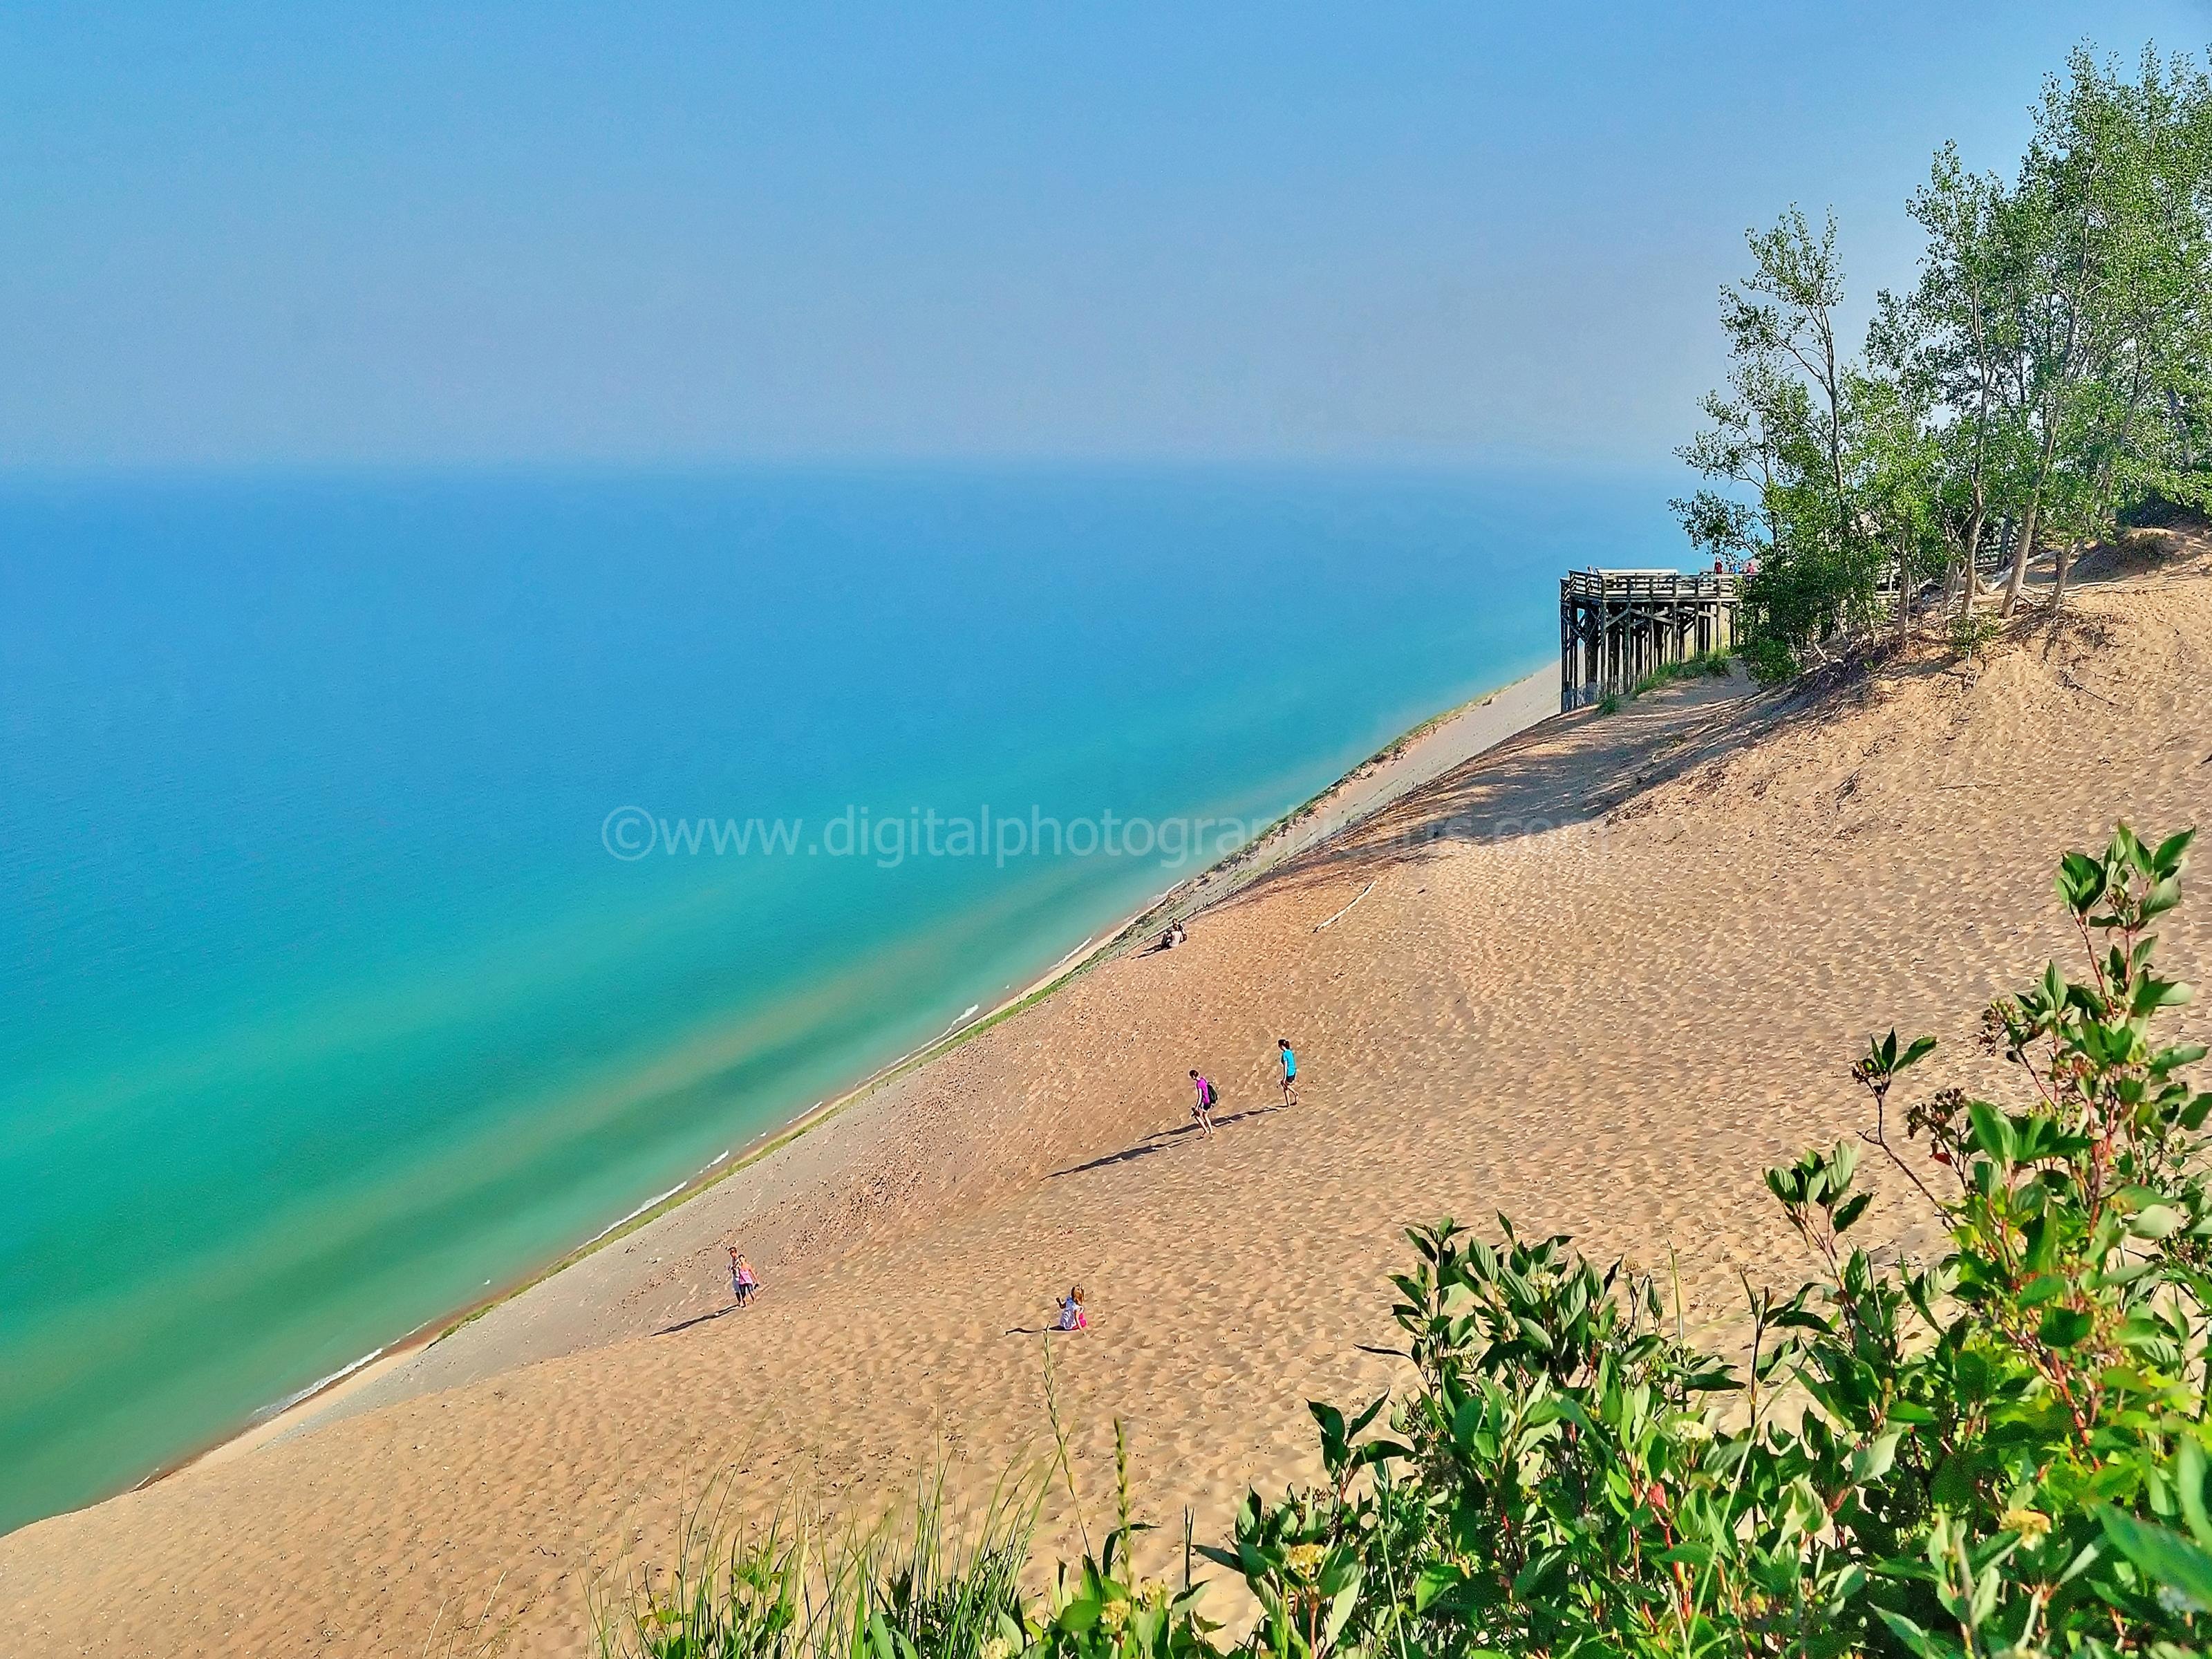 Sleeping Bear Dunes National Lakeshore Coastline Great Lakes Lake Michigan Landscape